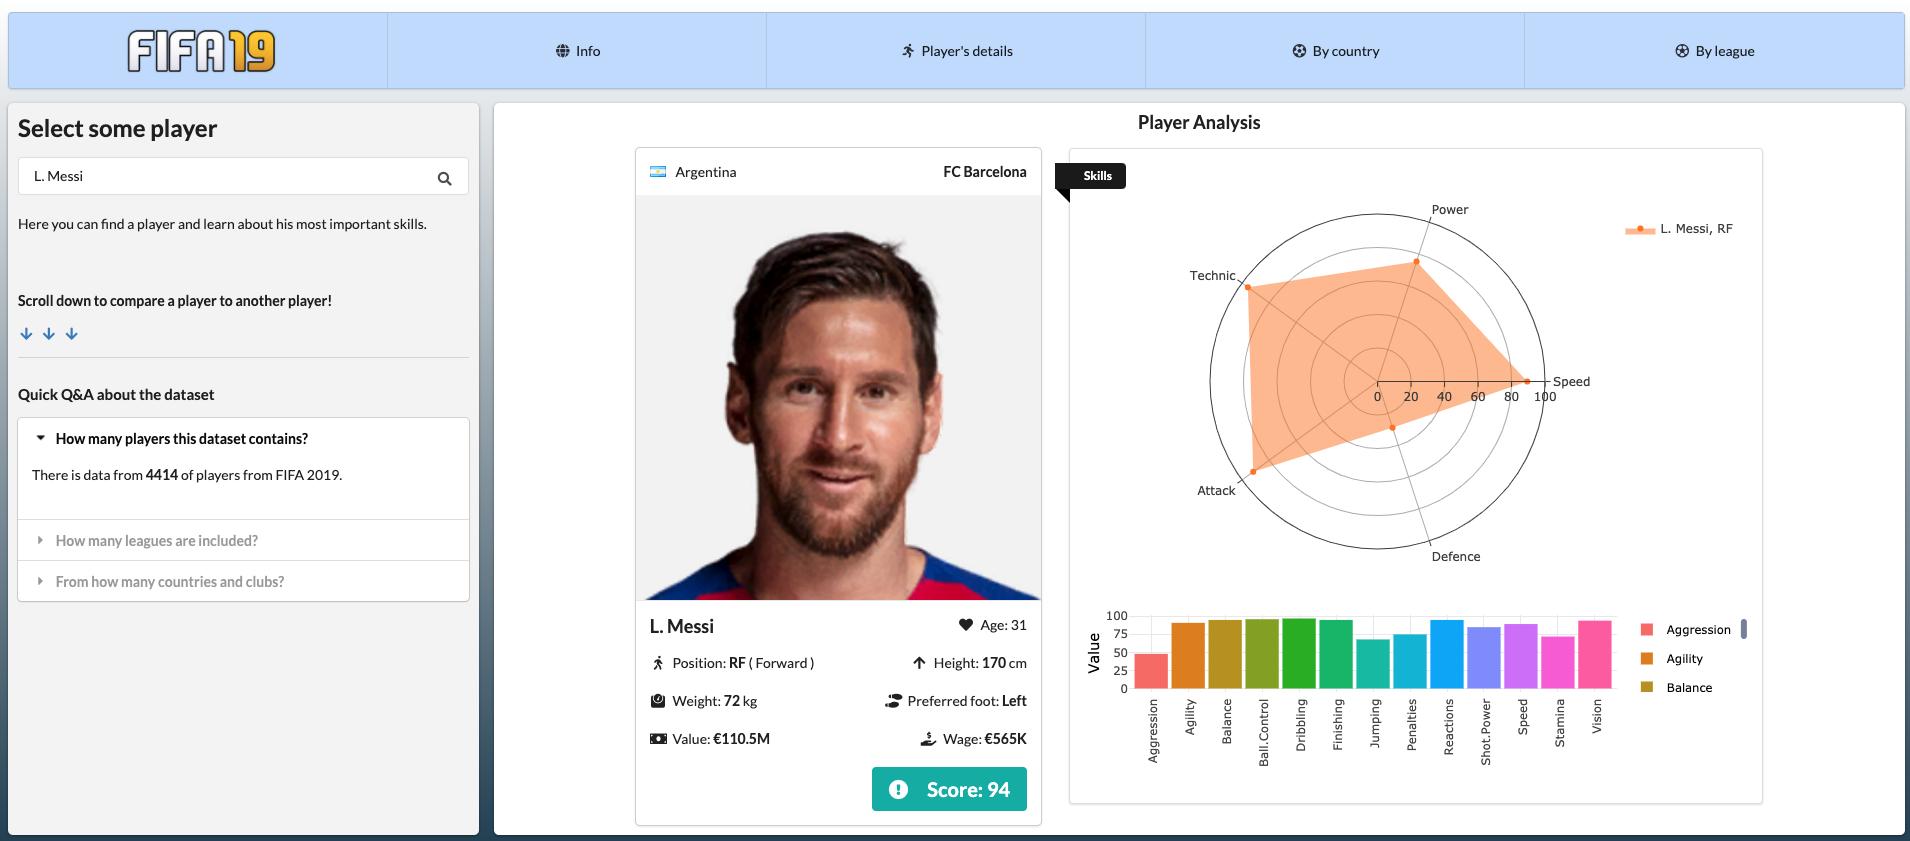 Screenshot from FIFA 19 app